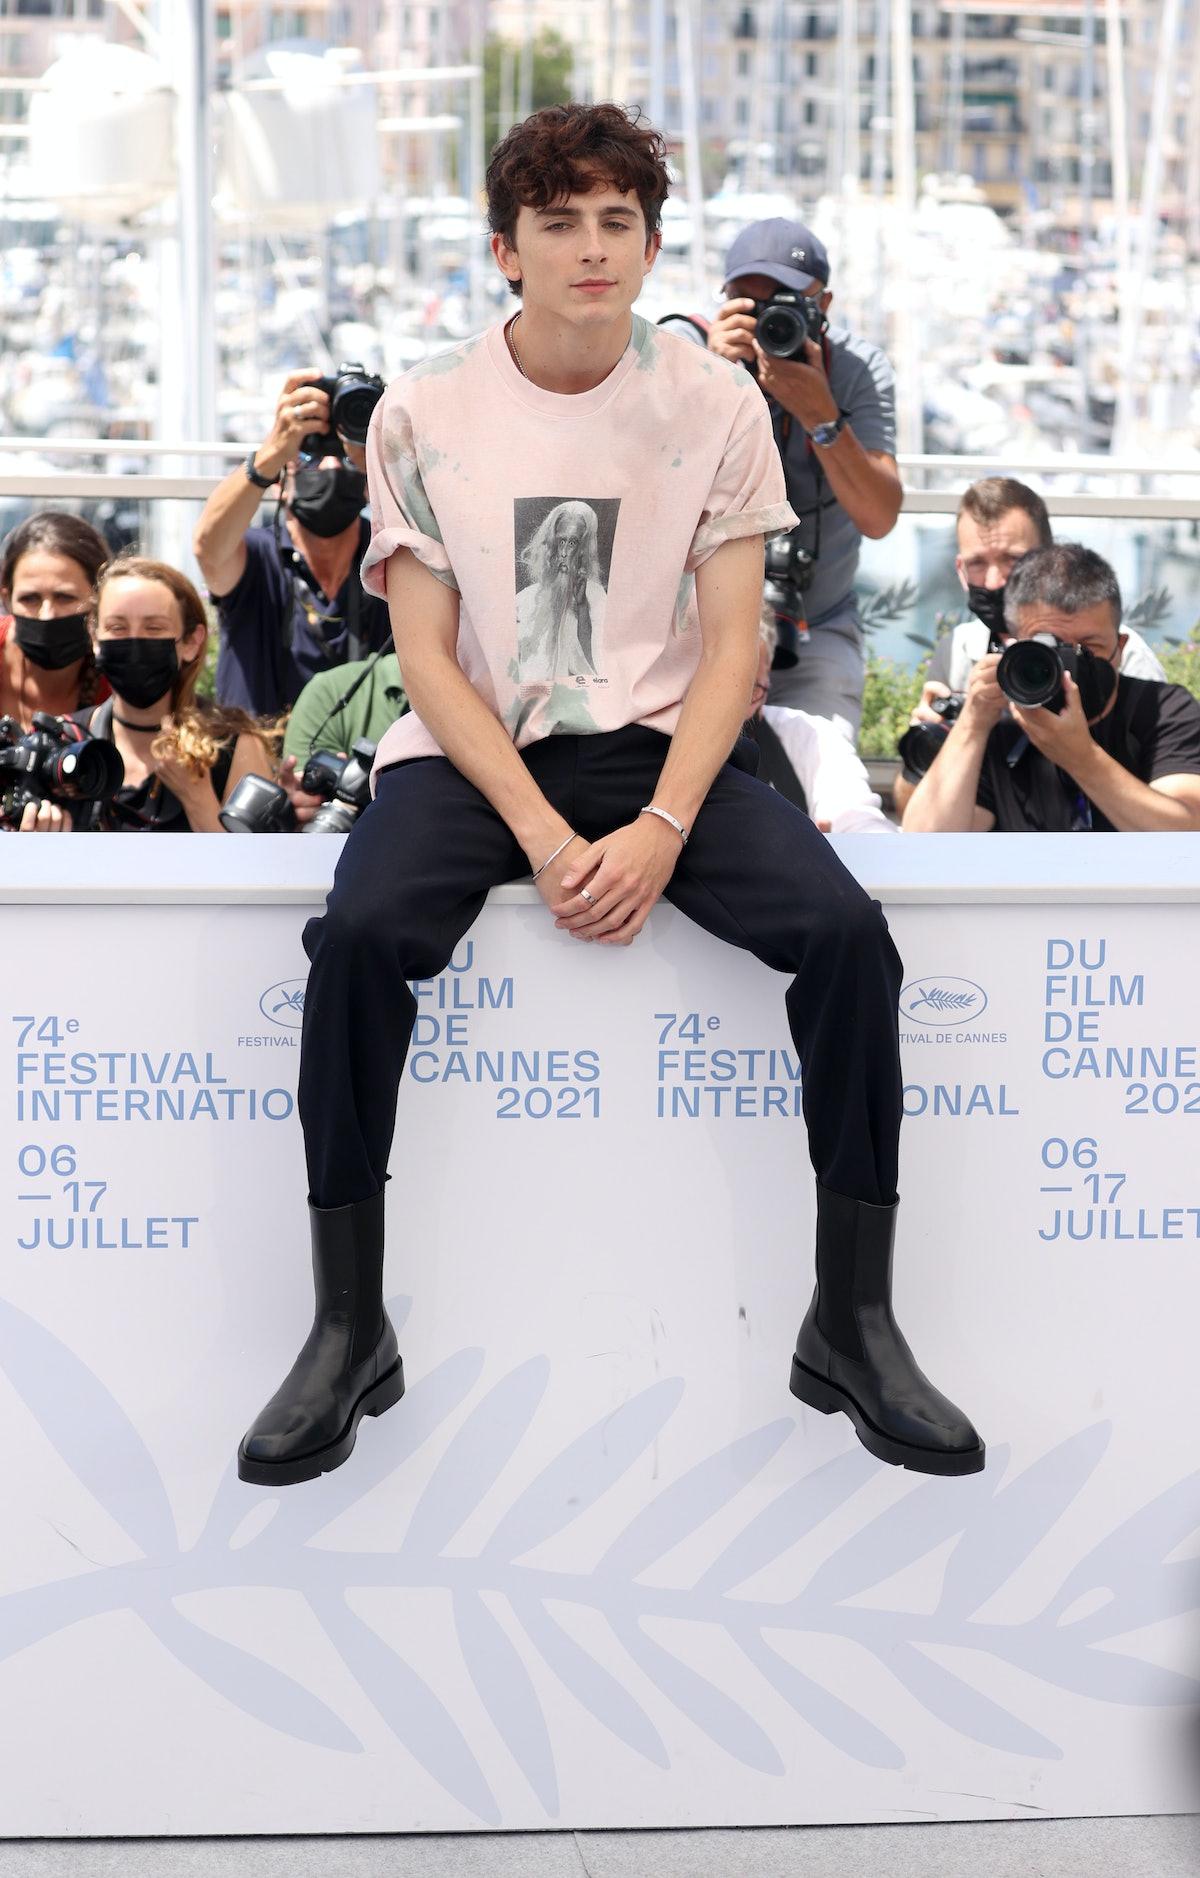 Timothée Chalamet wearing a Richard Pryor t-shirt at the Cannes Film Festival